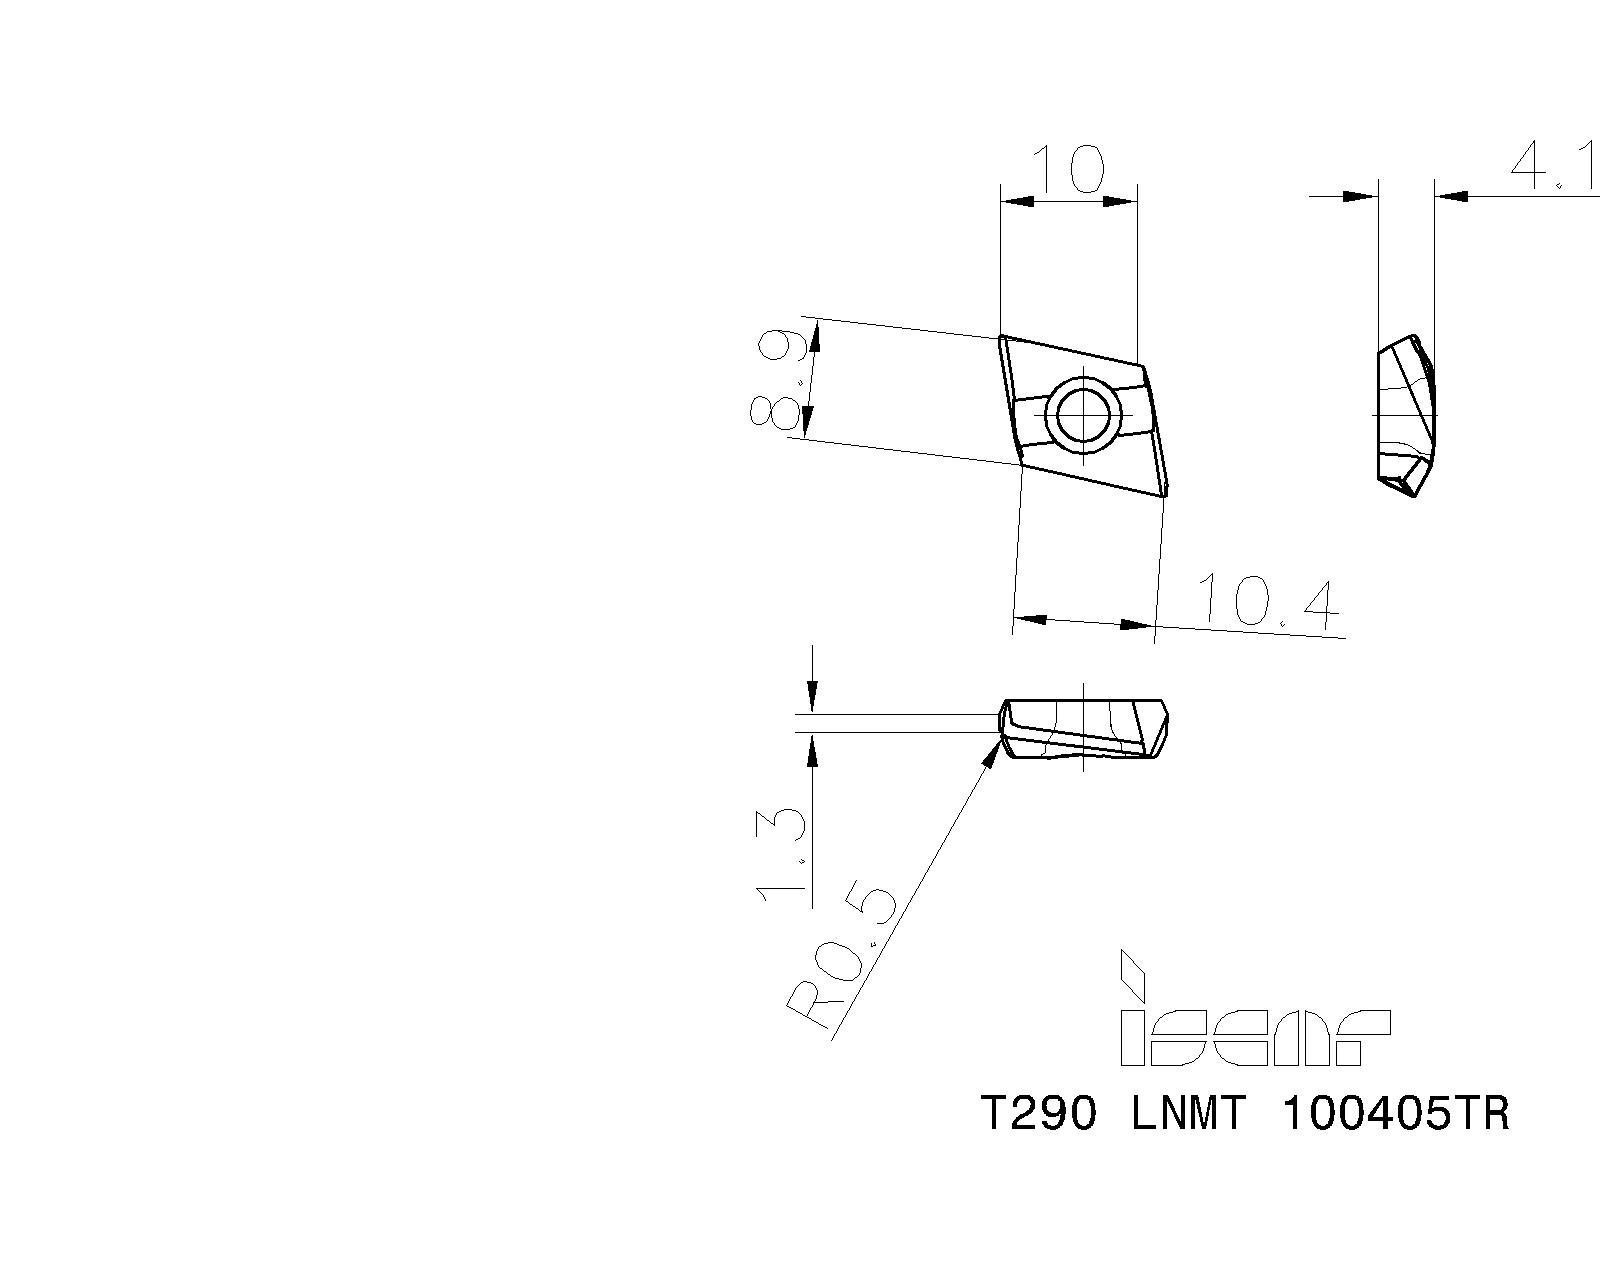 T290 LNMT 100405TR IC5100